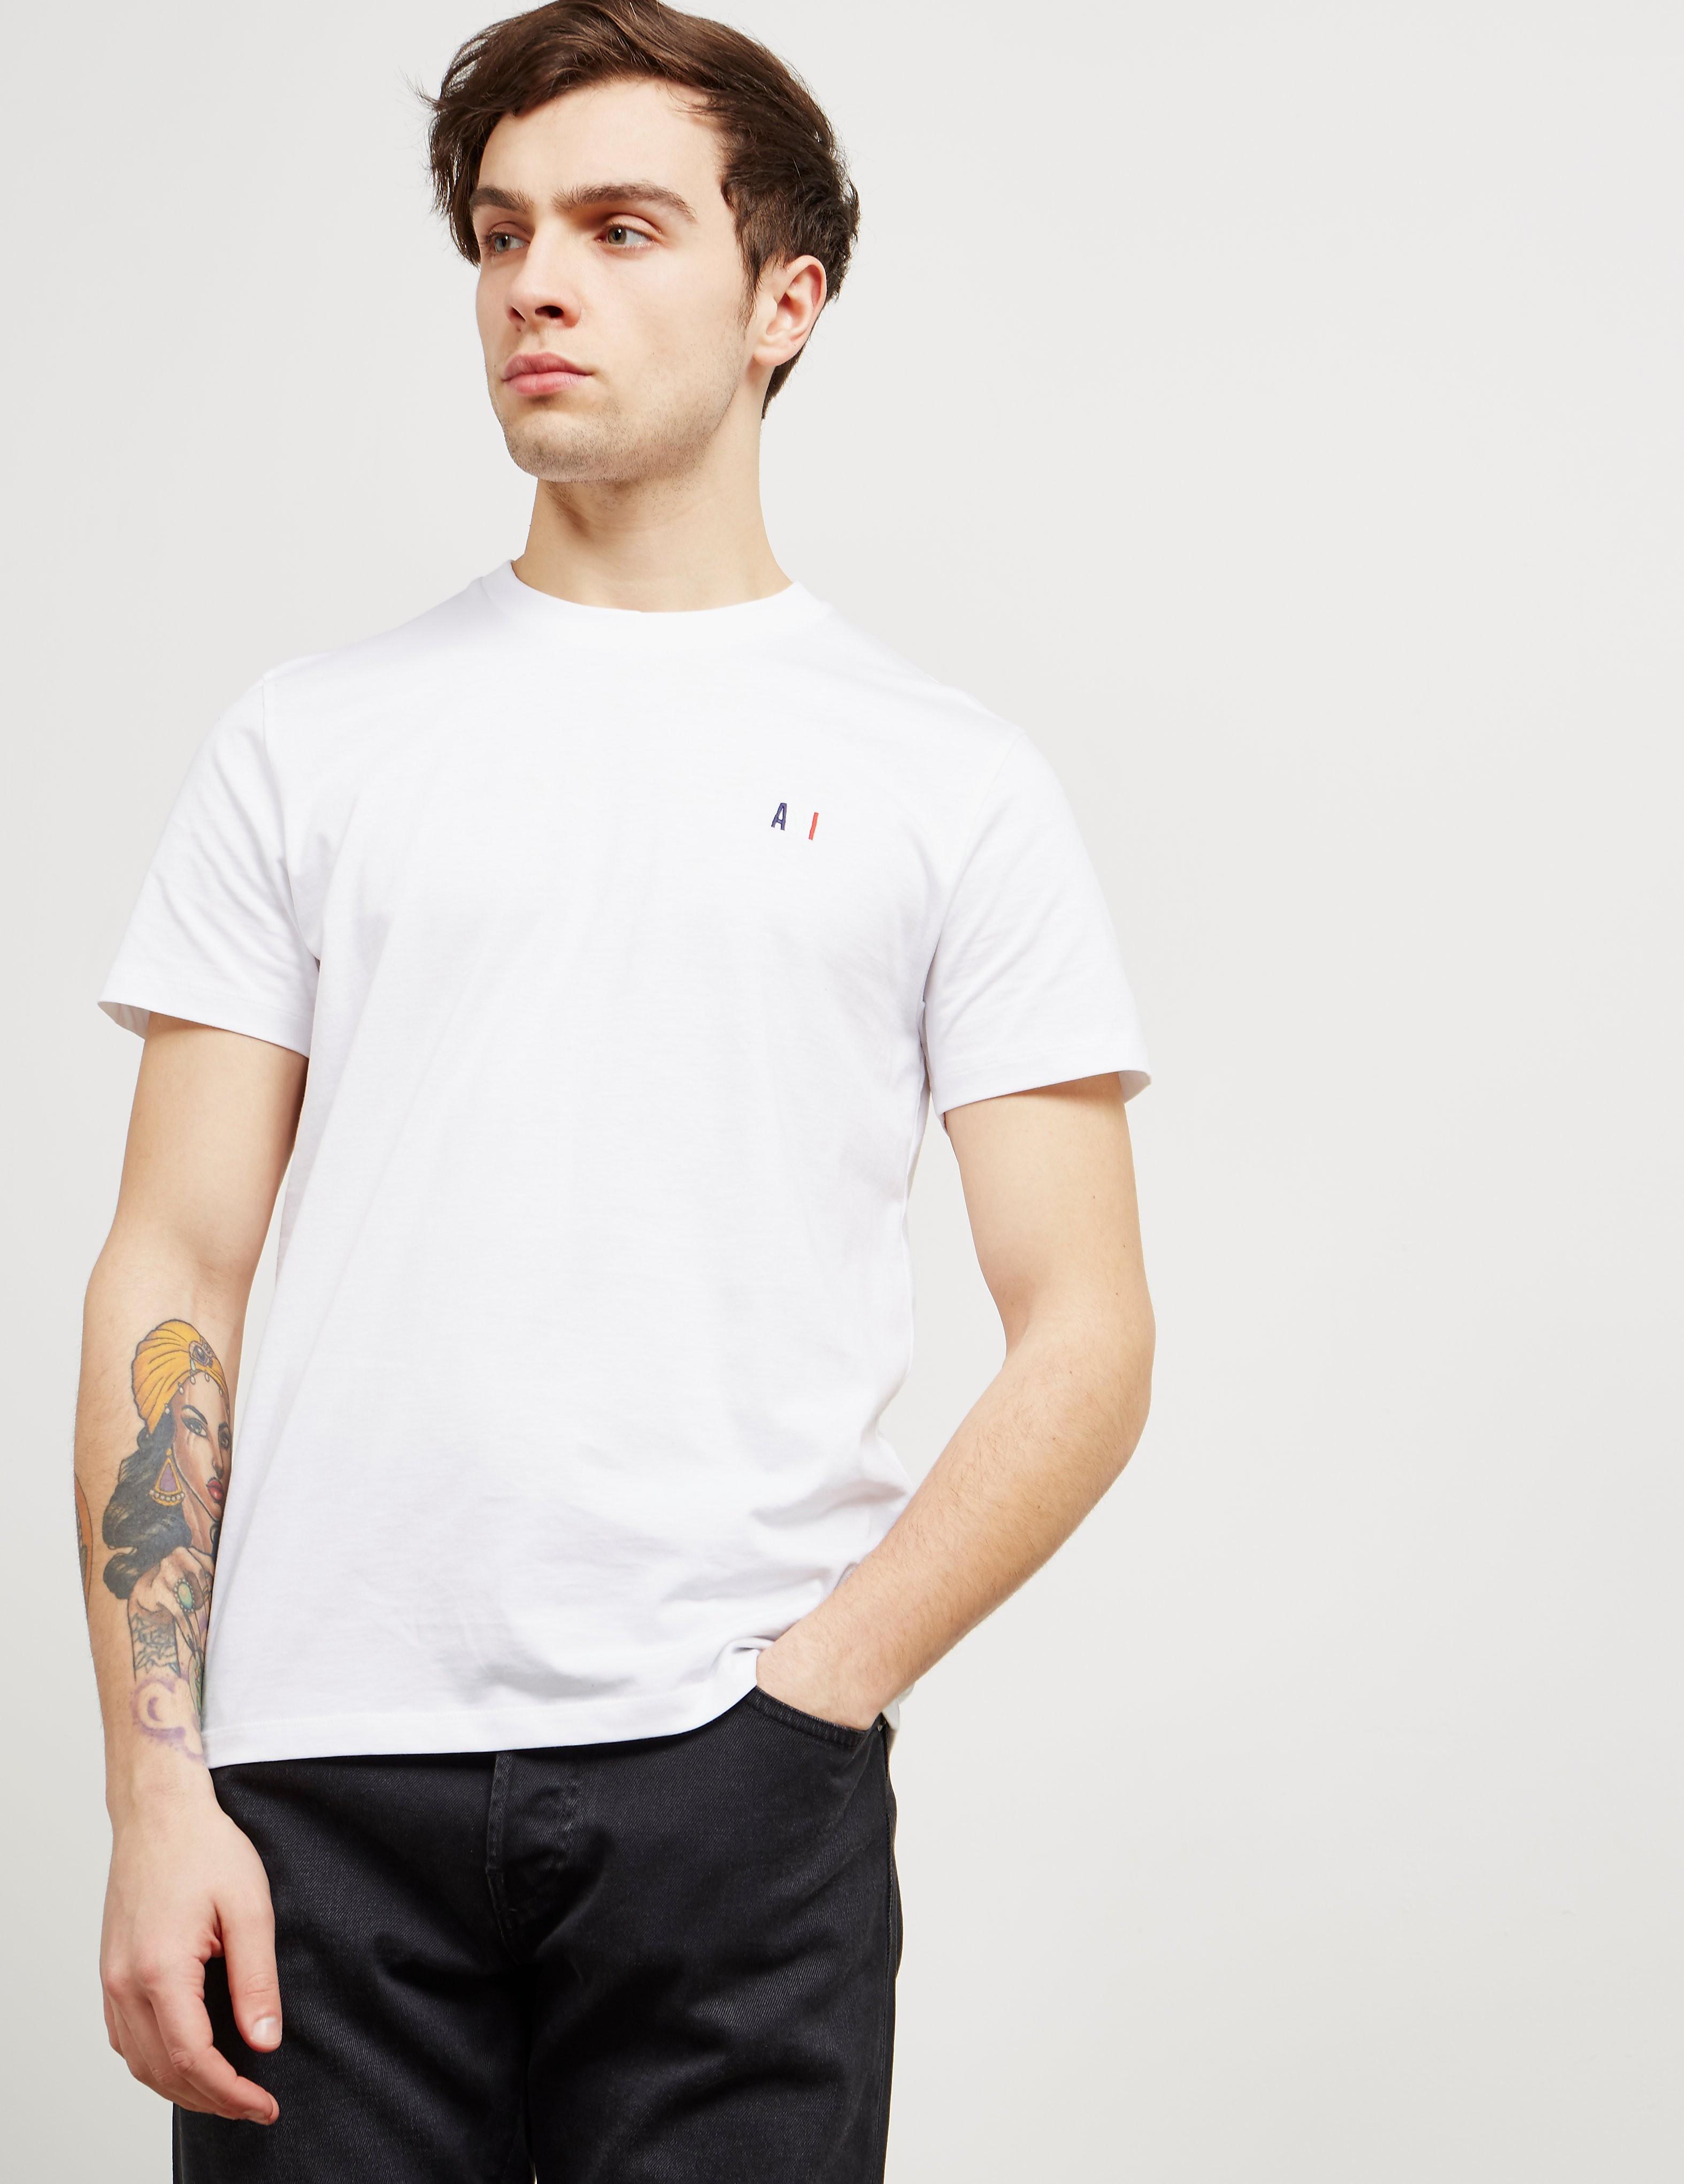 AMI Paris Small Logo Short Sleeve T-Shirt